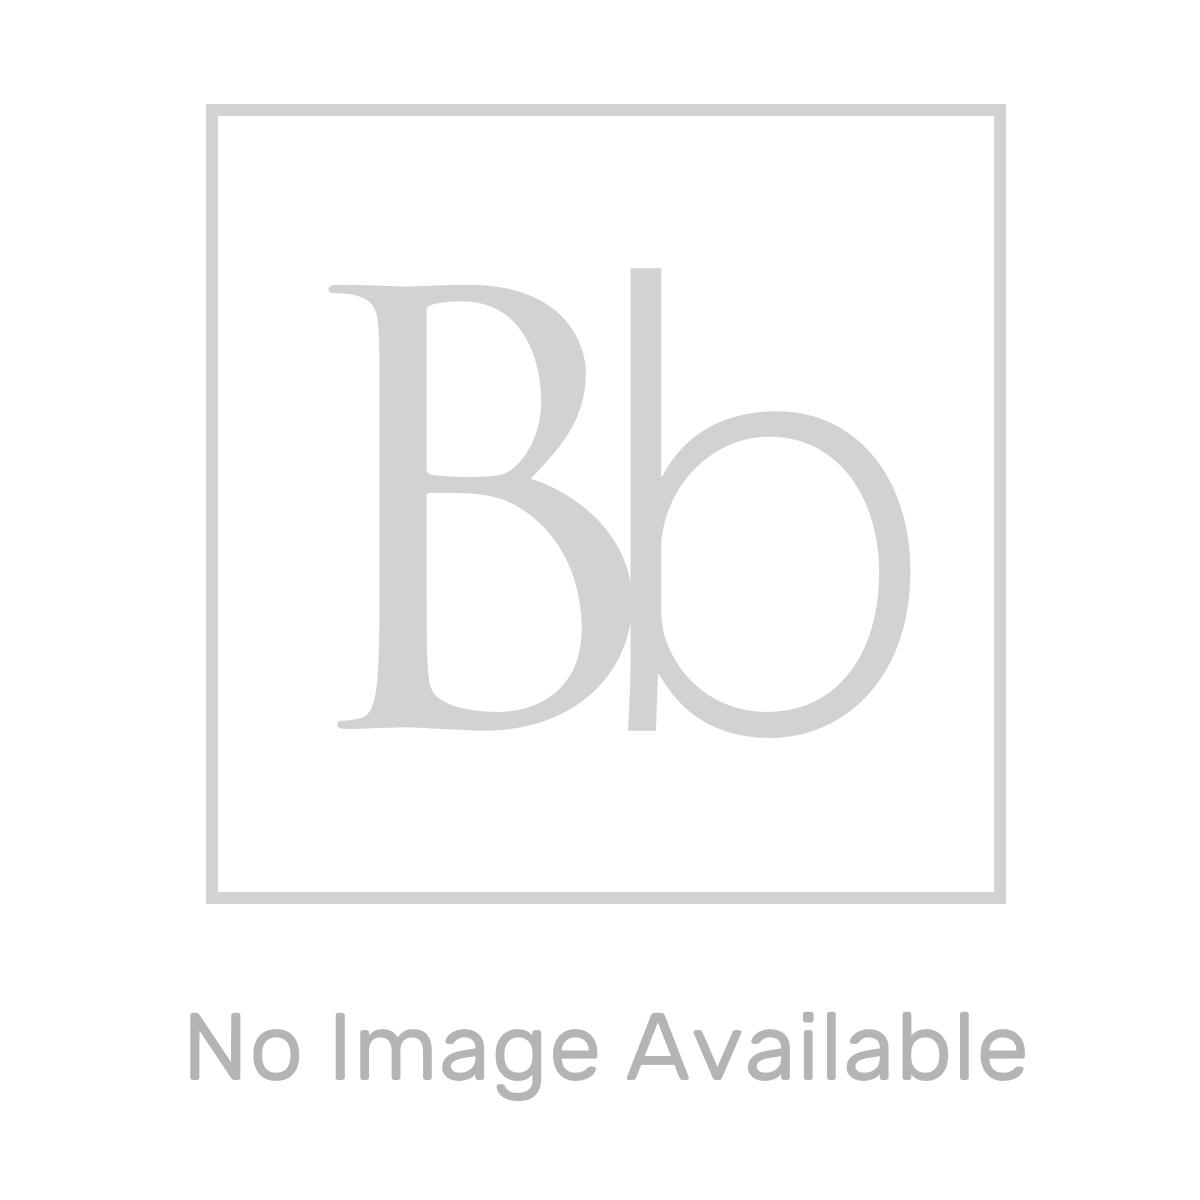 Merlyn MStone Square Shower Tray 900 x 900mm